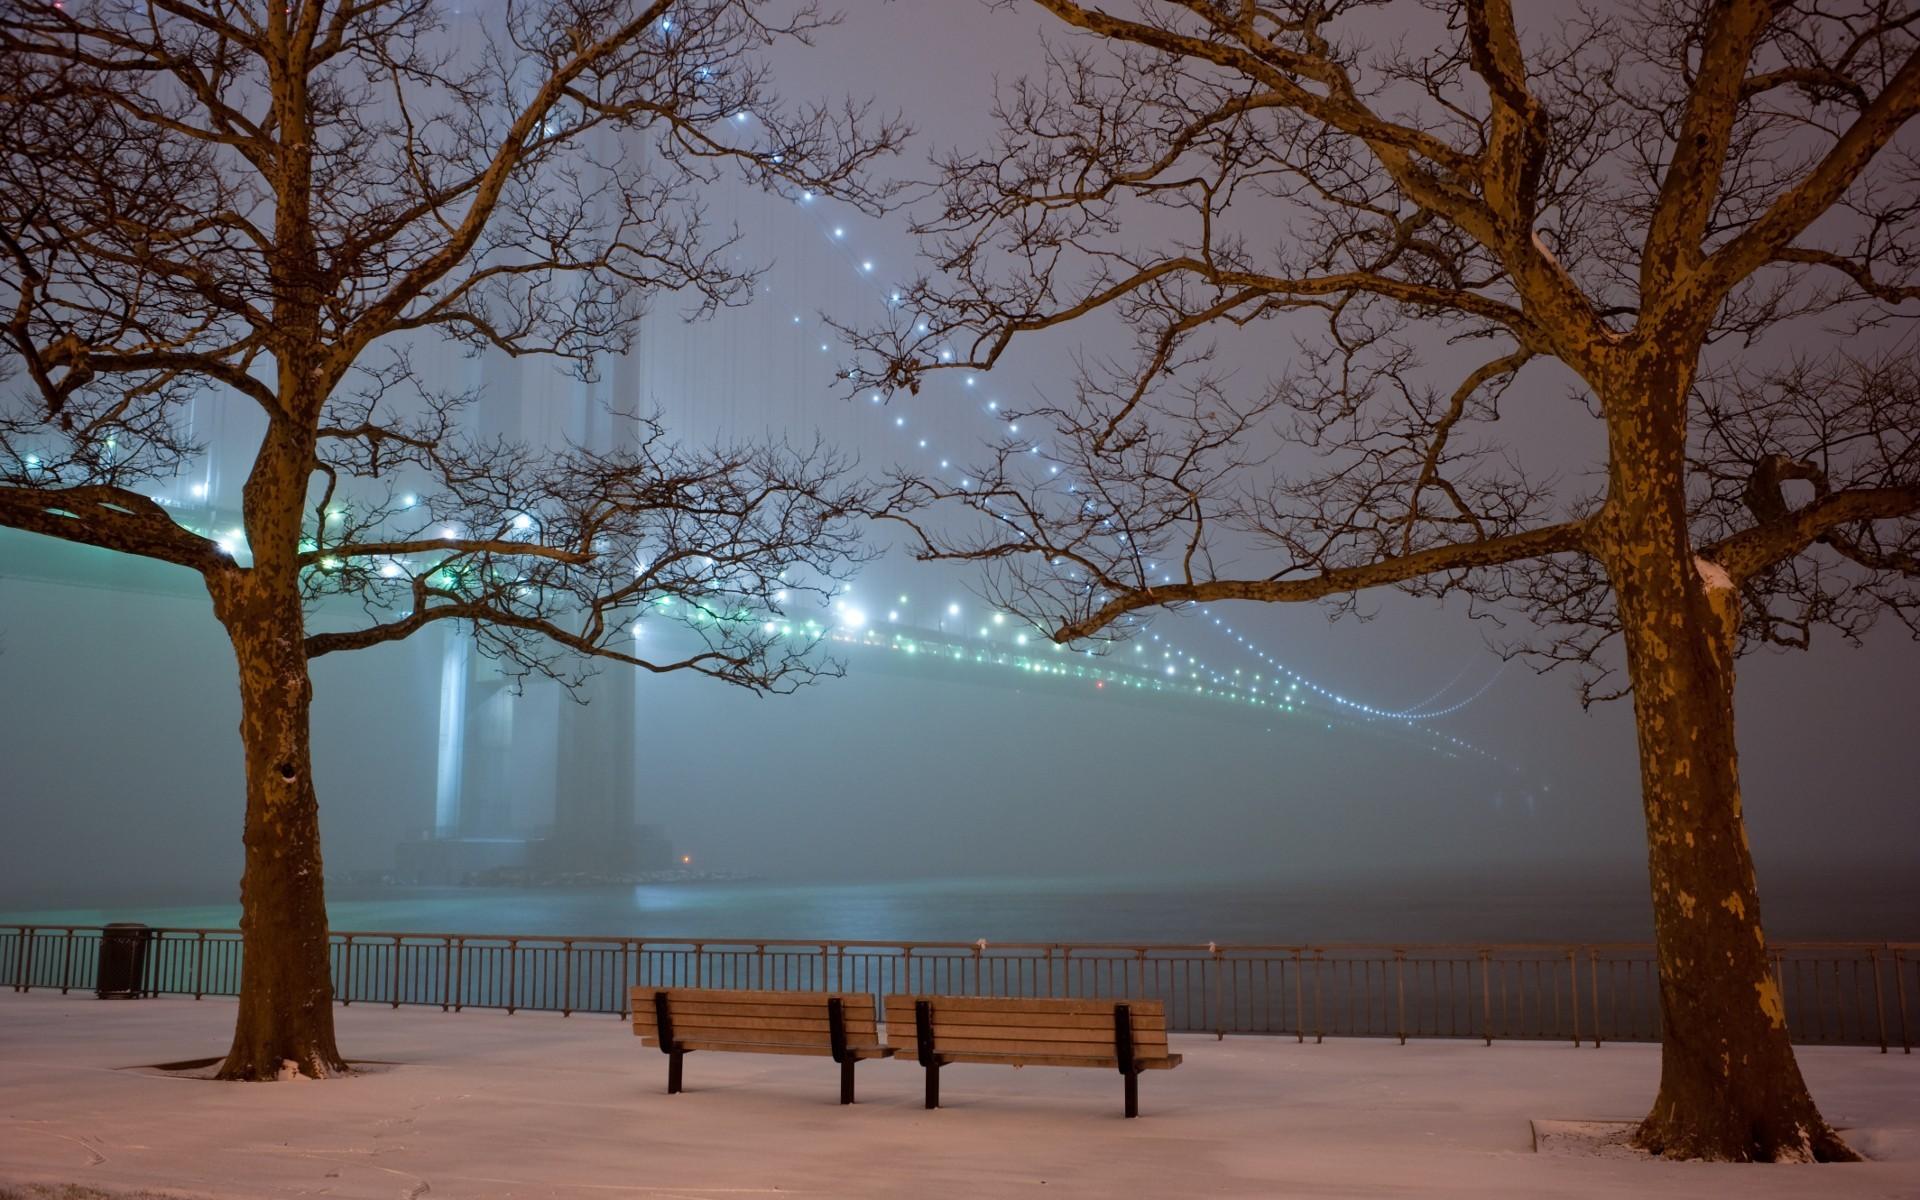 Related Desktop Backgrounds. New York Christmas